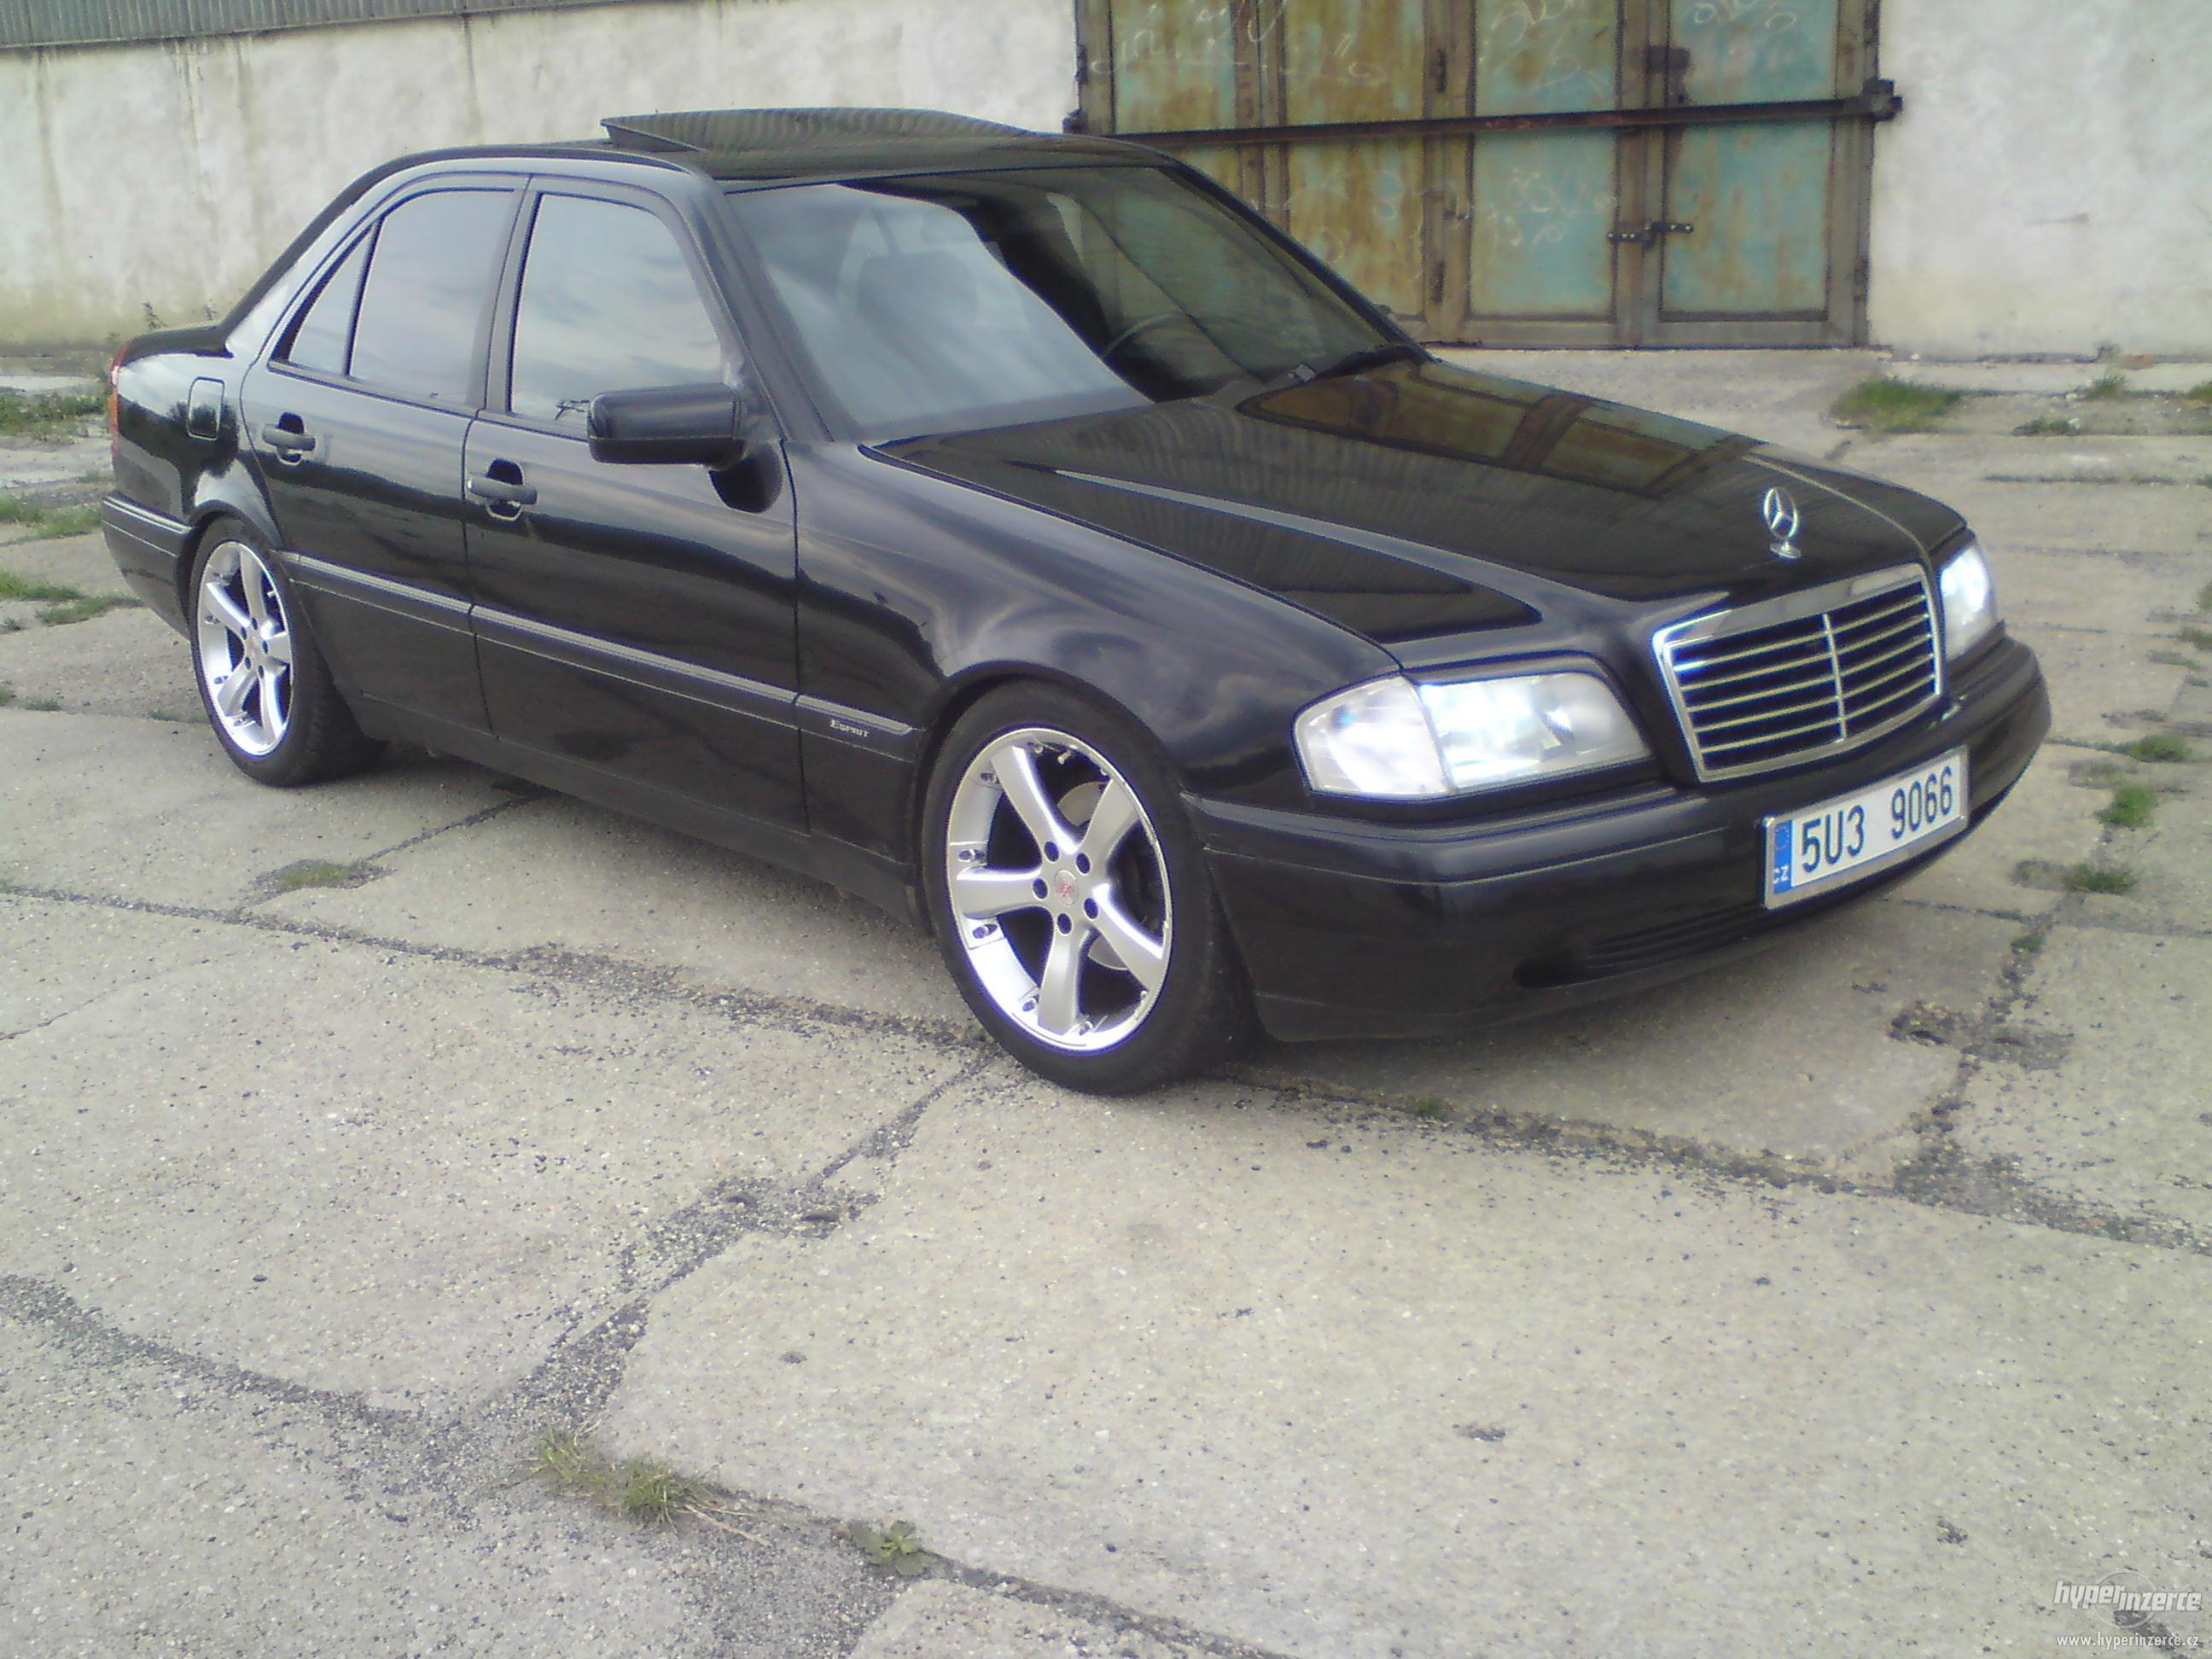 Mercedes benz c180 esprit photos reviews news specs for Buy a mercedes benz